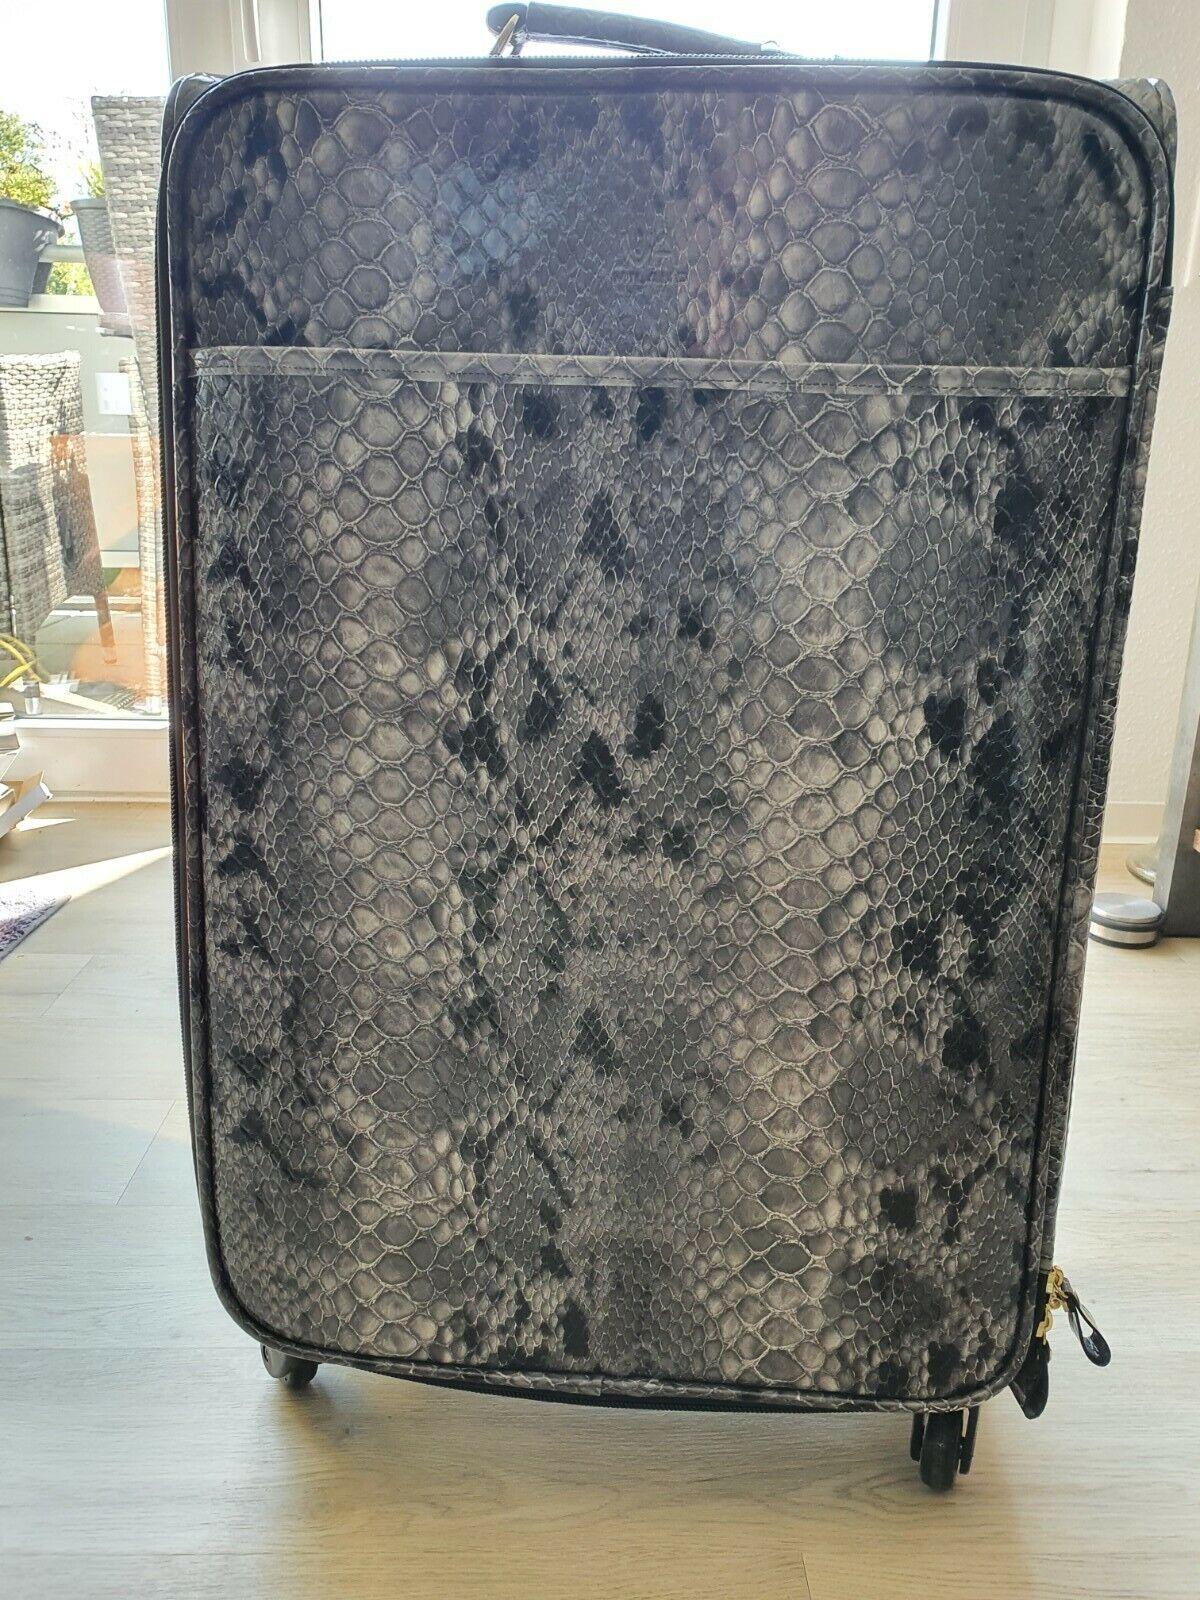 Reisekoffer Koffer VA MILANO Kunstleder schwarz/grau Krokoprägung 72x45x24 cm